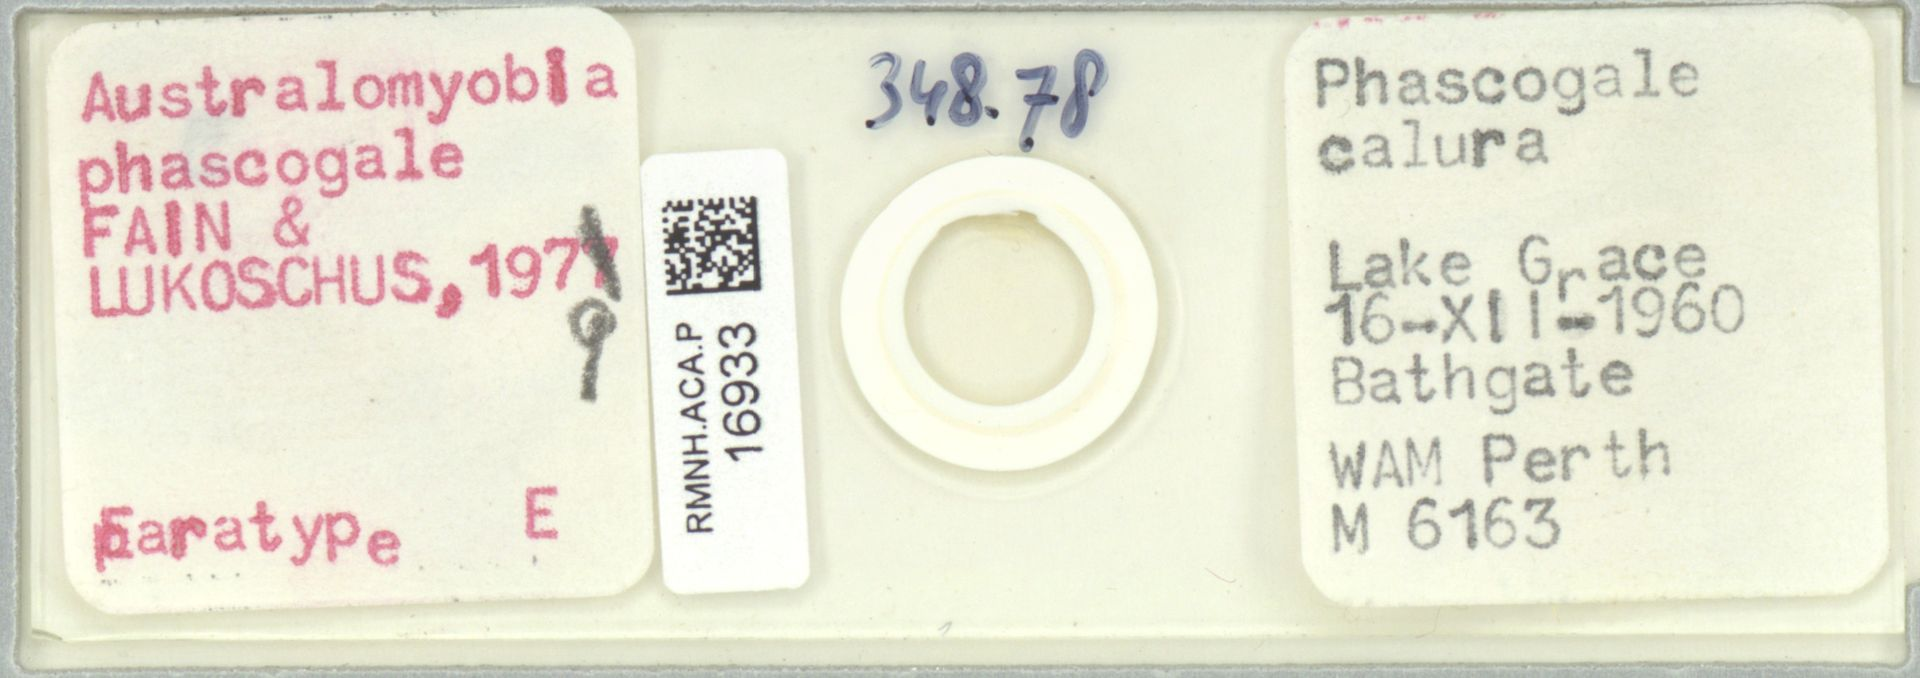 RMNH.ACA.P.16933 | Australomyobia phascogale